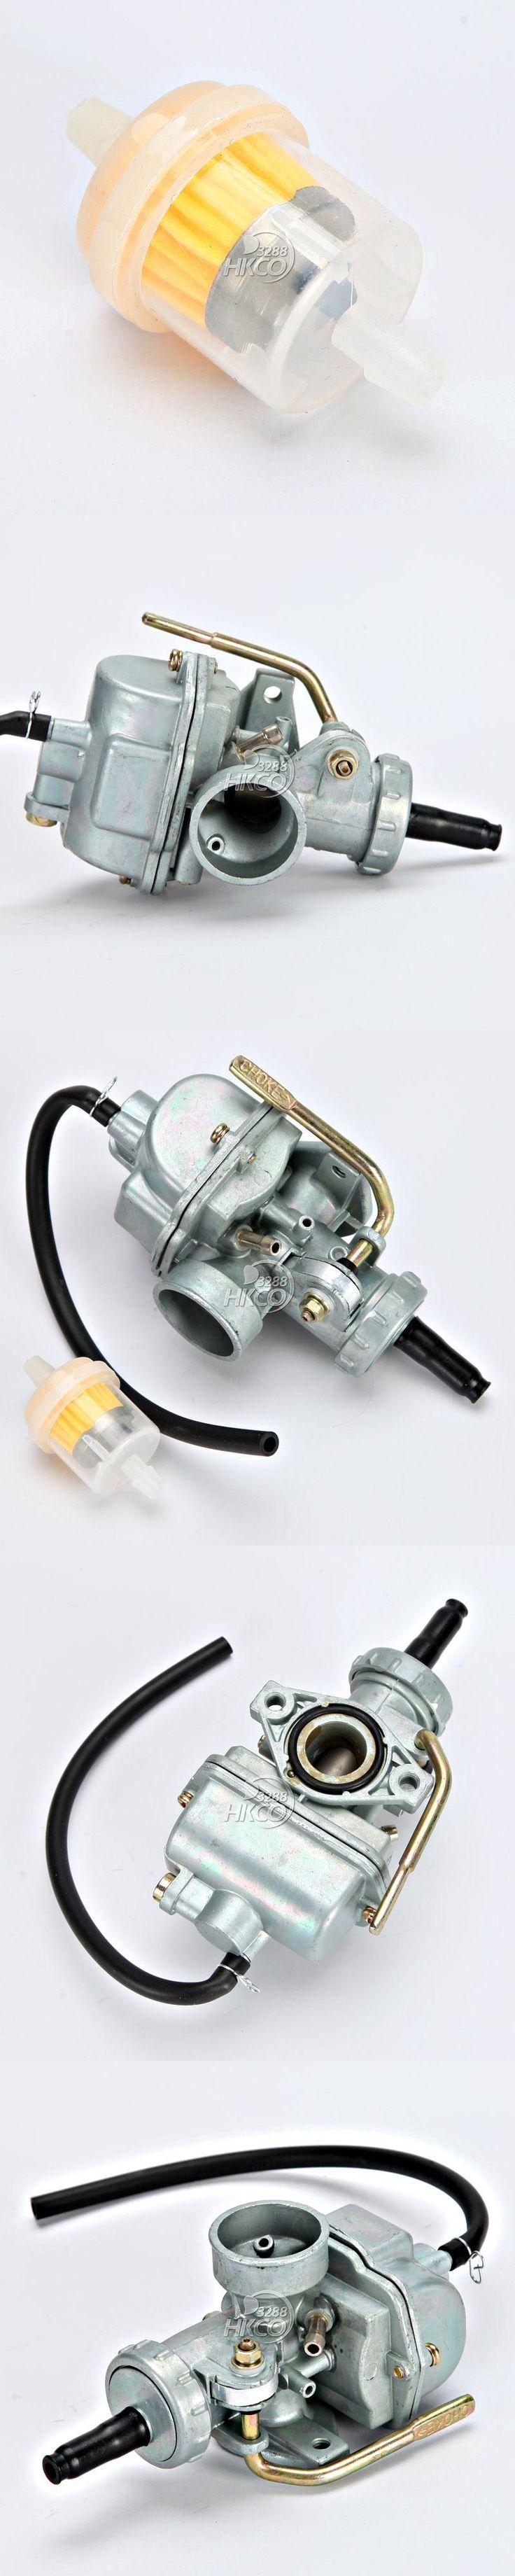 Motorcycle 18mm Carburetor Carb + 33mm Fuel Filter For Honda Dirt Bike XR80 1979-1984